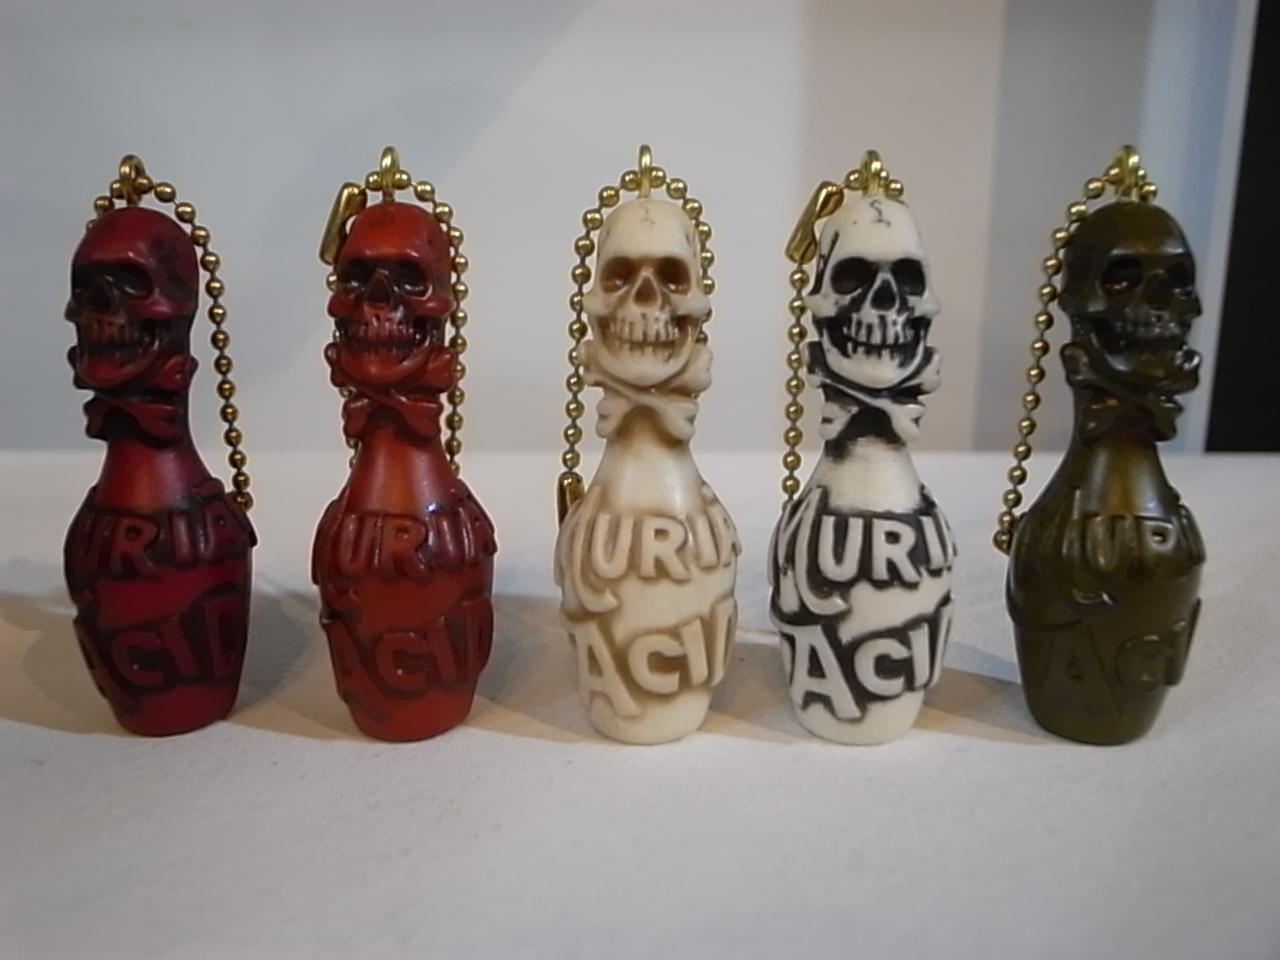 F.B.S.R.MODELS 薬瓶とキーチェーン_a0097901_1701063.jpg